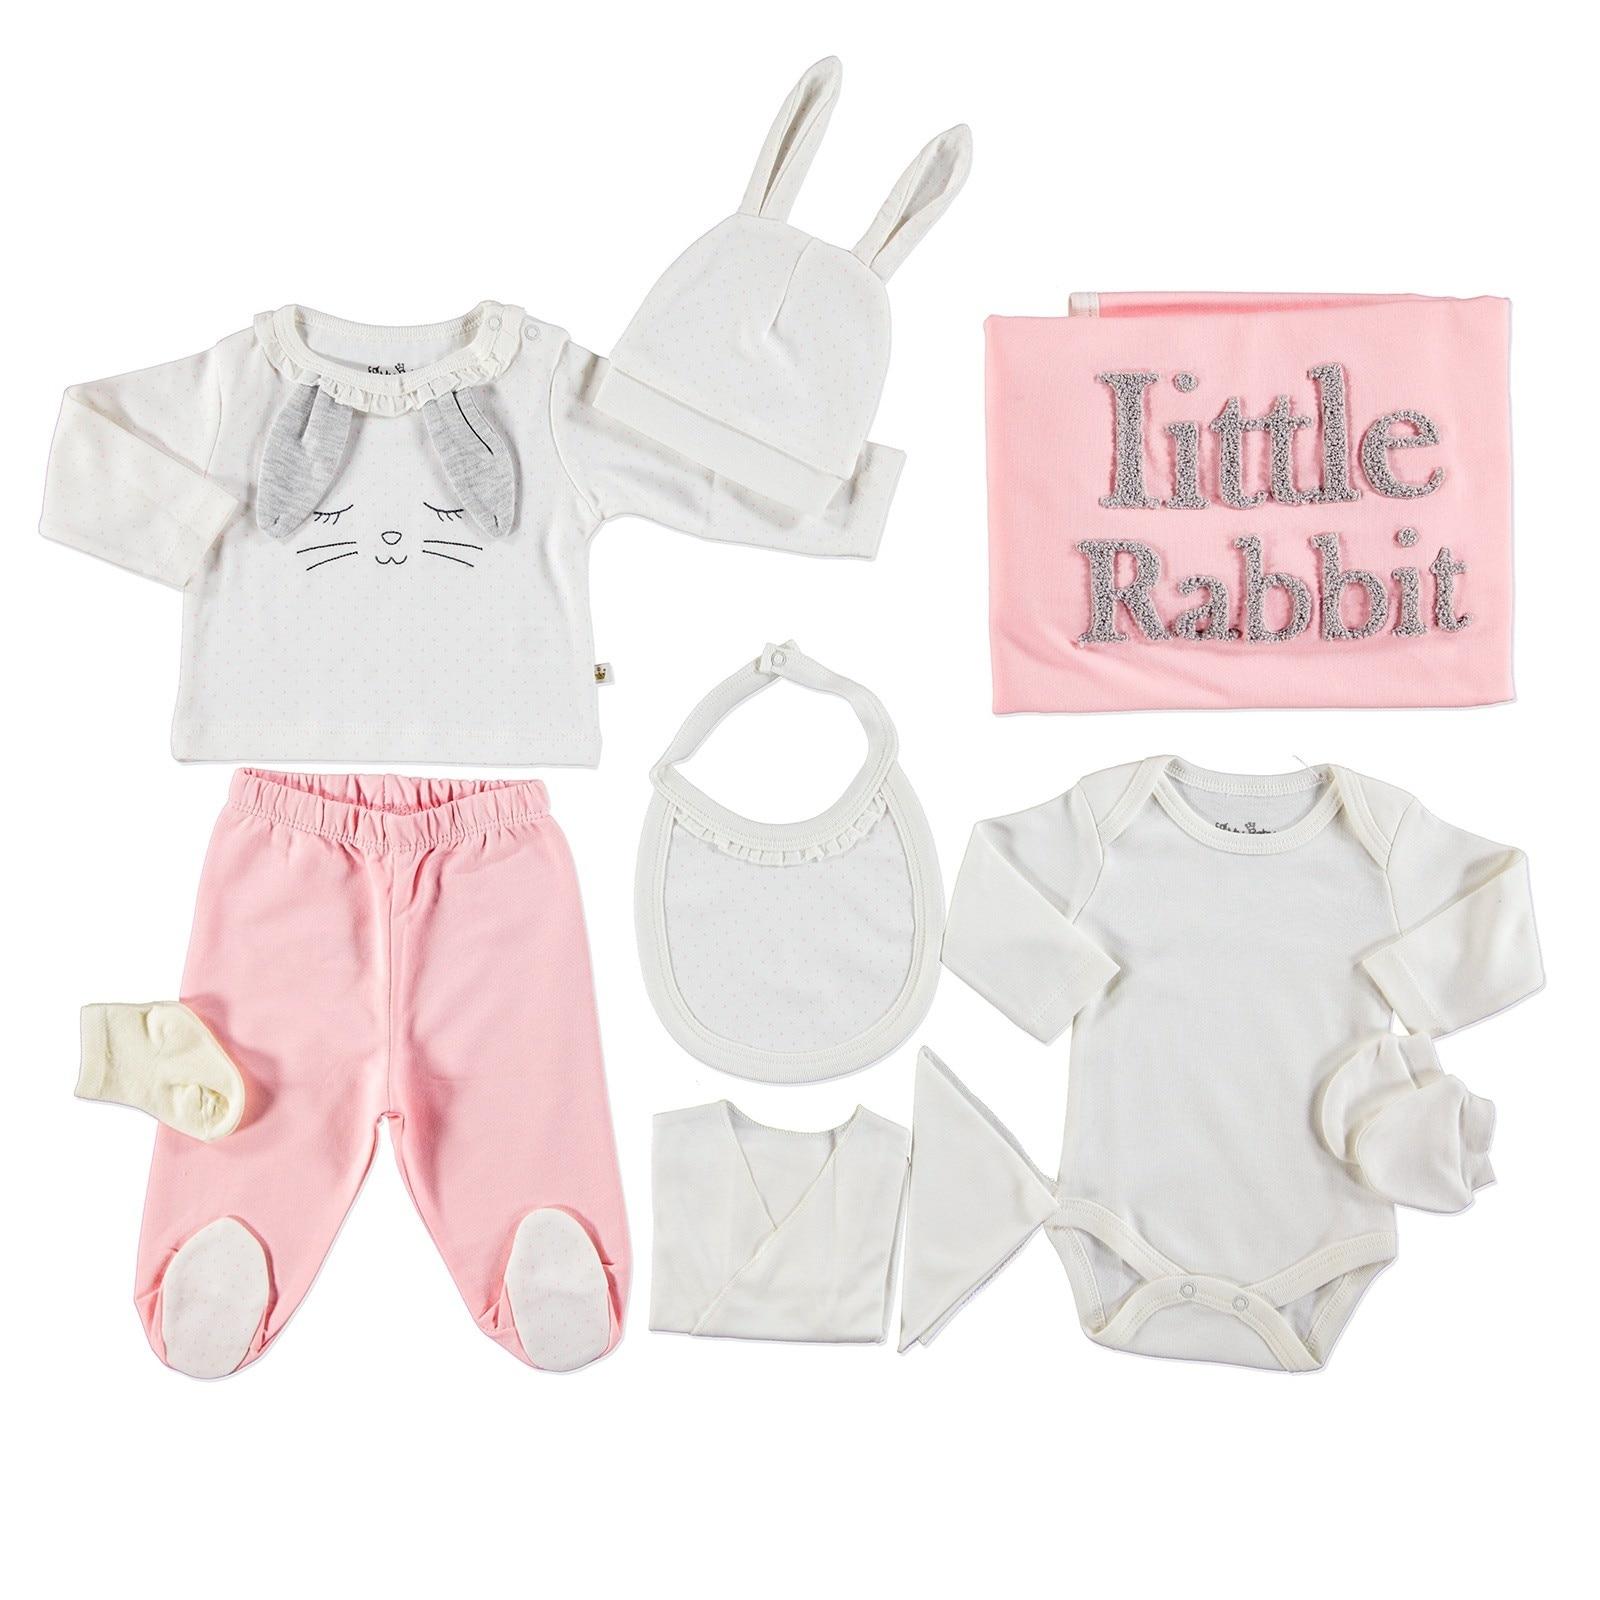 Ebebek For My Baby Bunny Newborn Hospital Pack 10 Pcs